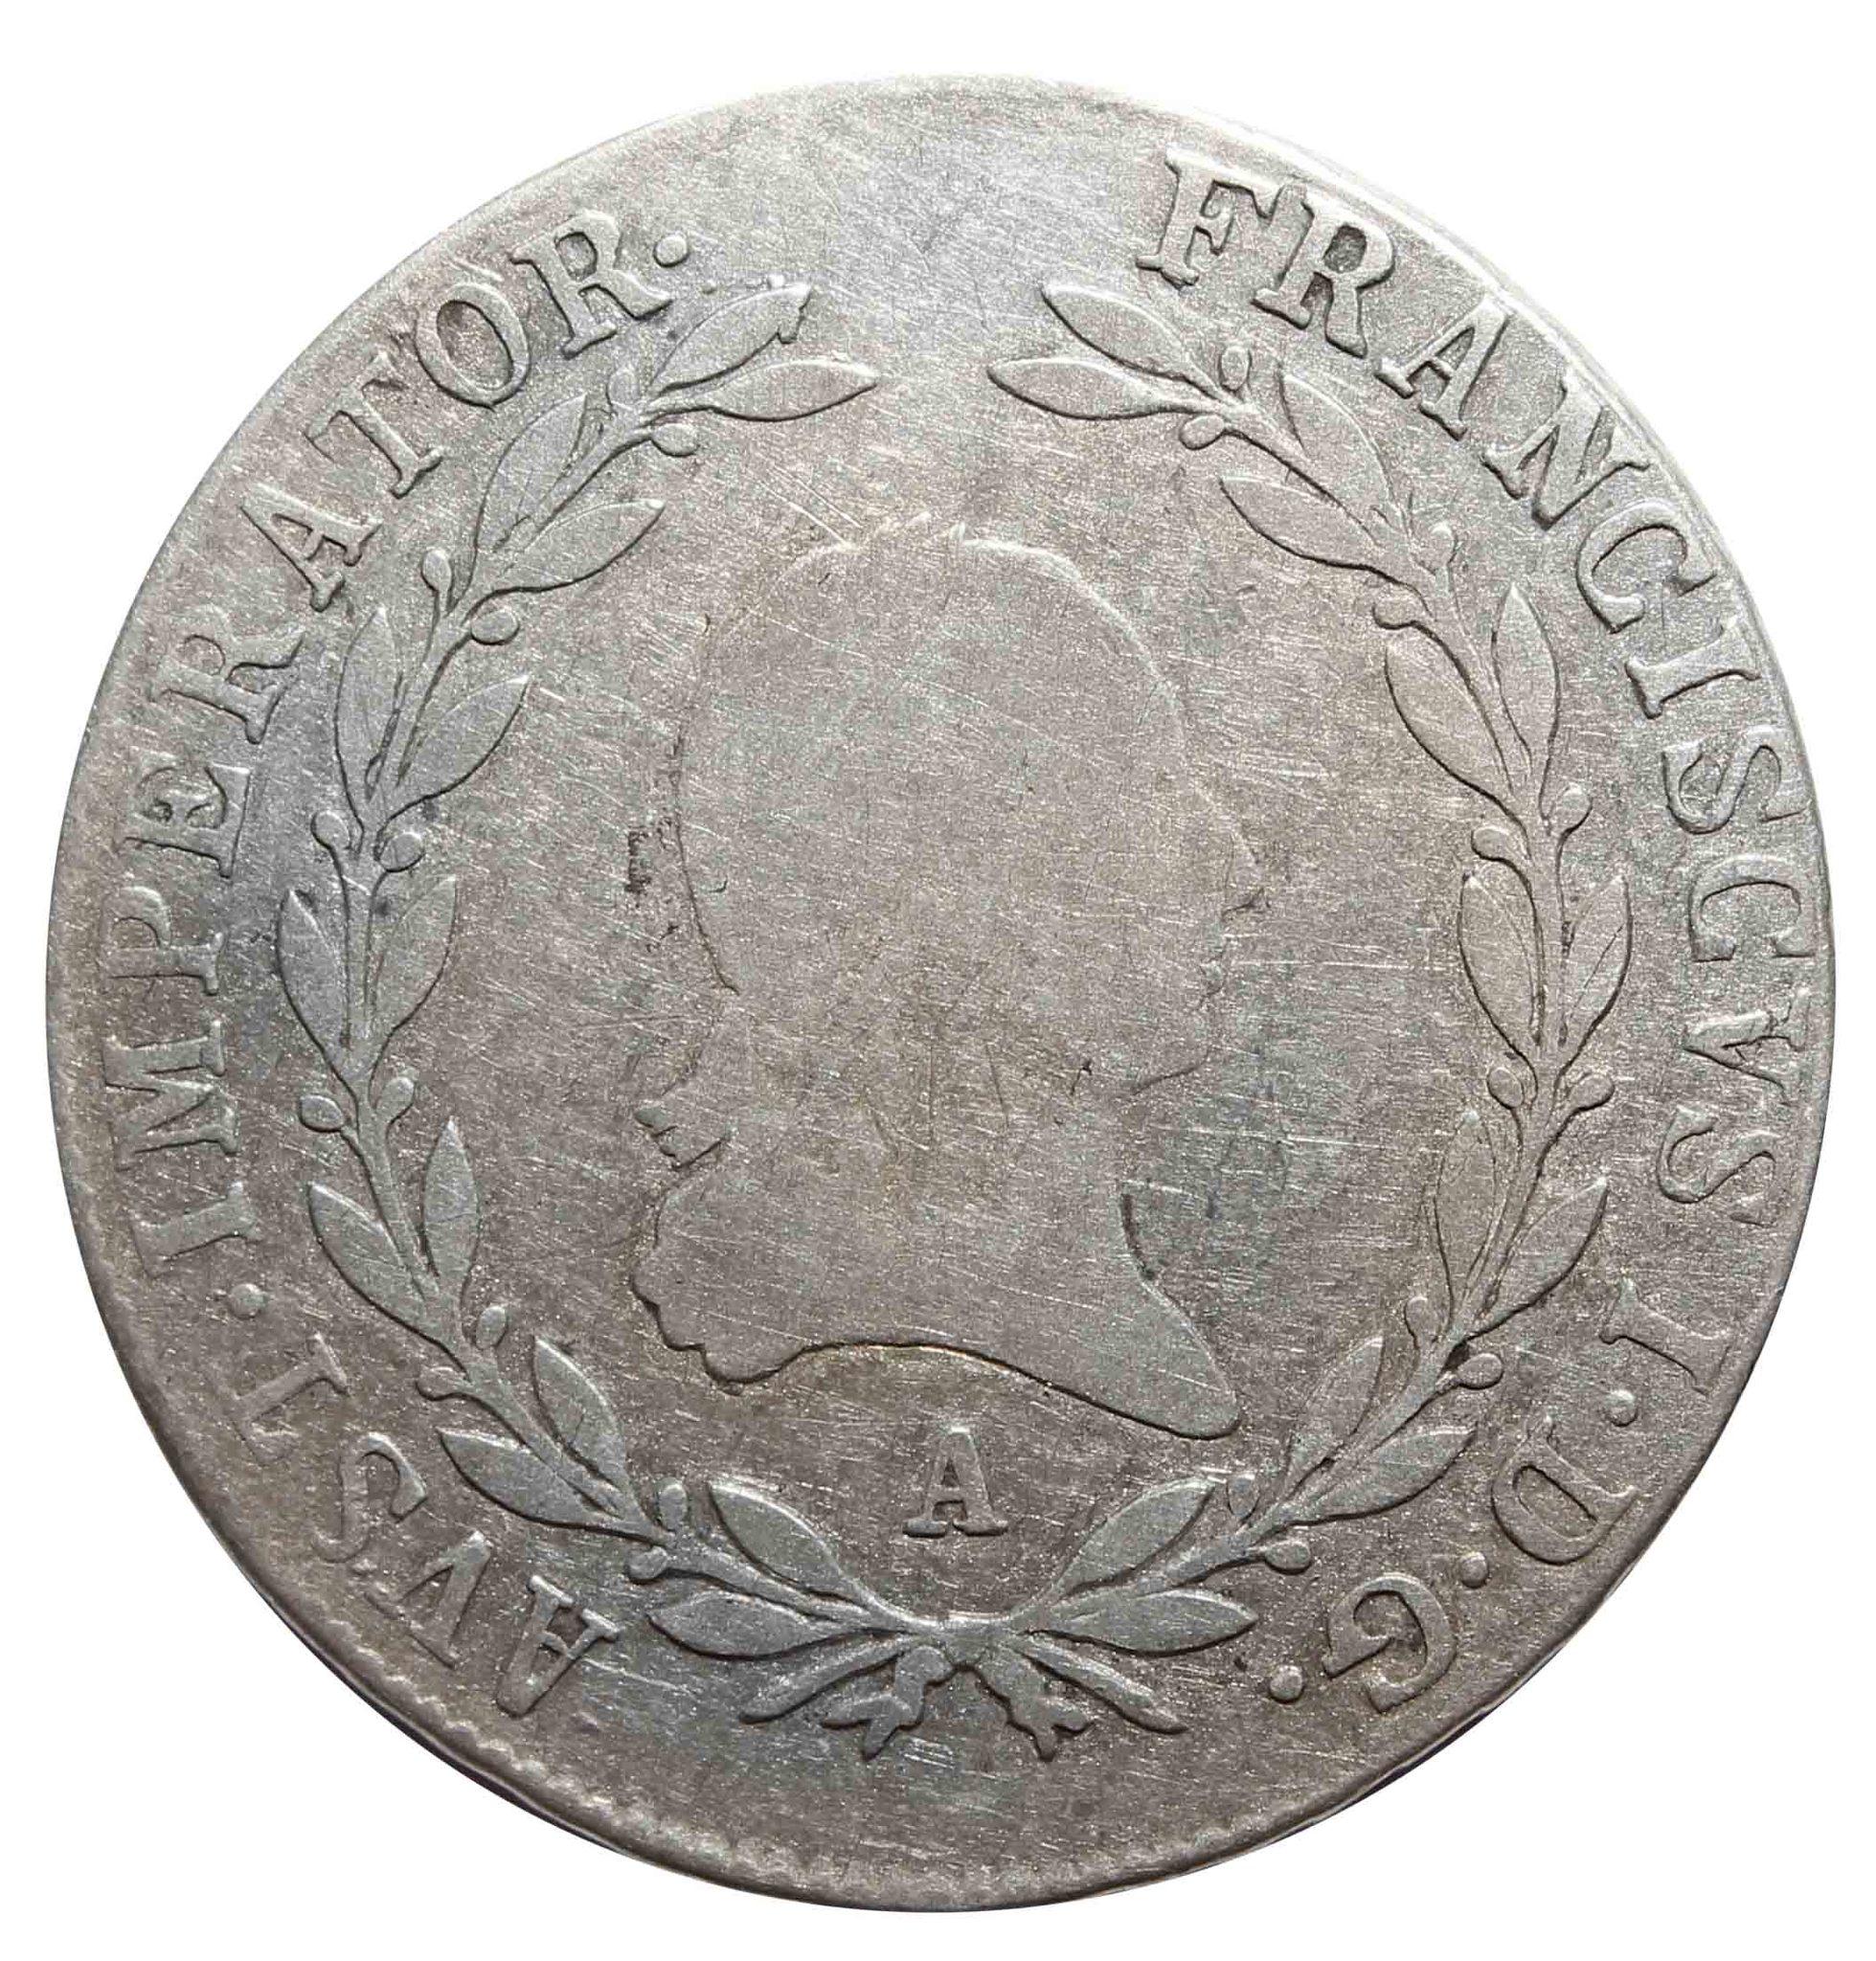 20 крейцеров. Франц I. А. Австрия. 1808 год. Серебро. F